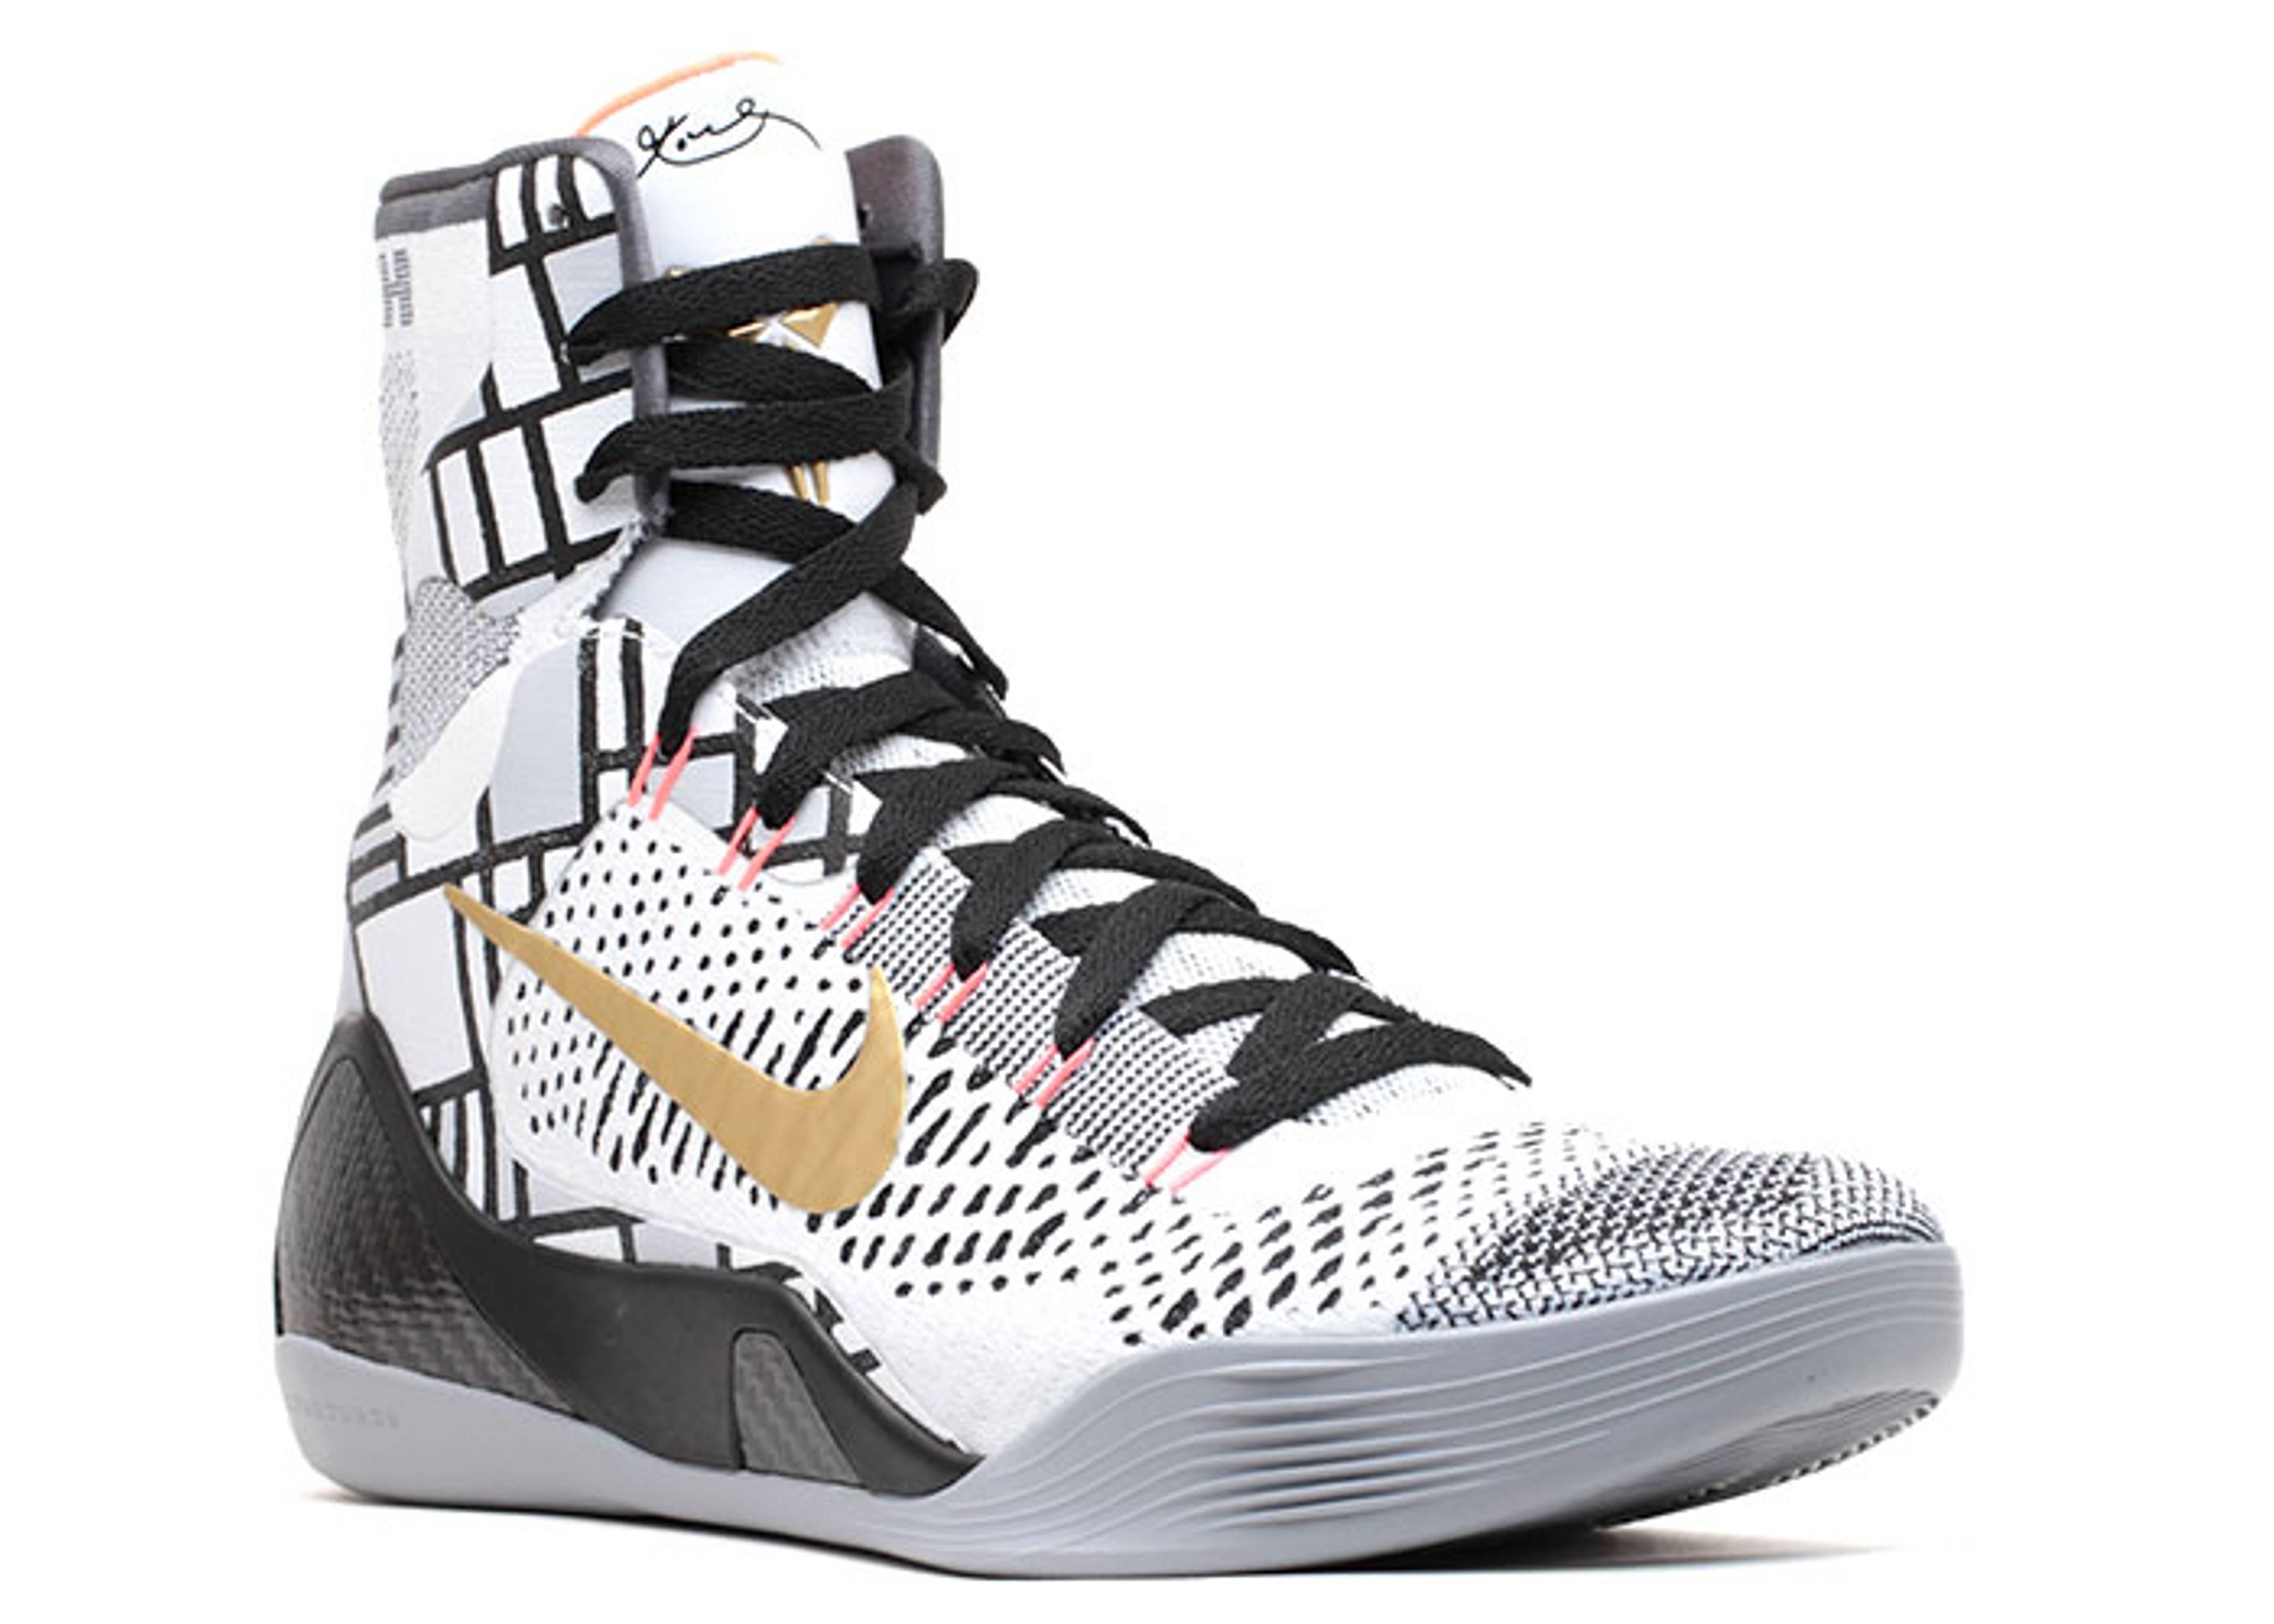 buy online 2530d 0c61a ... Black Basketball Shoes nike. kobe 9 elite ...